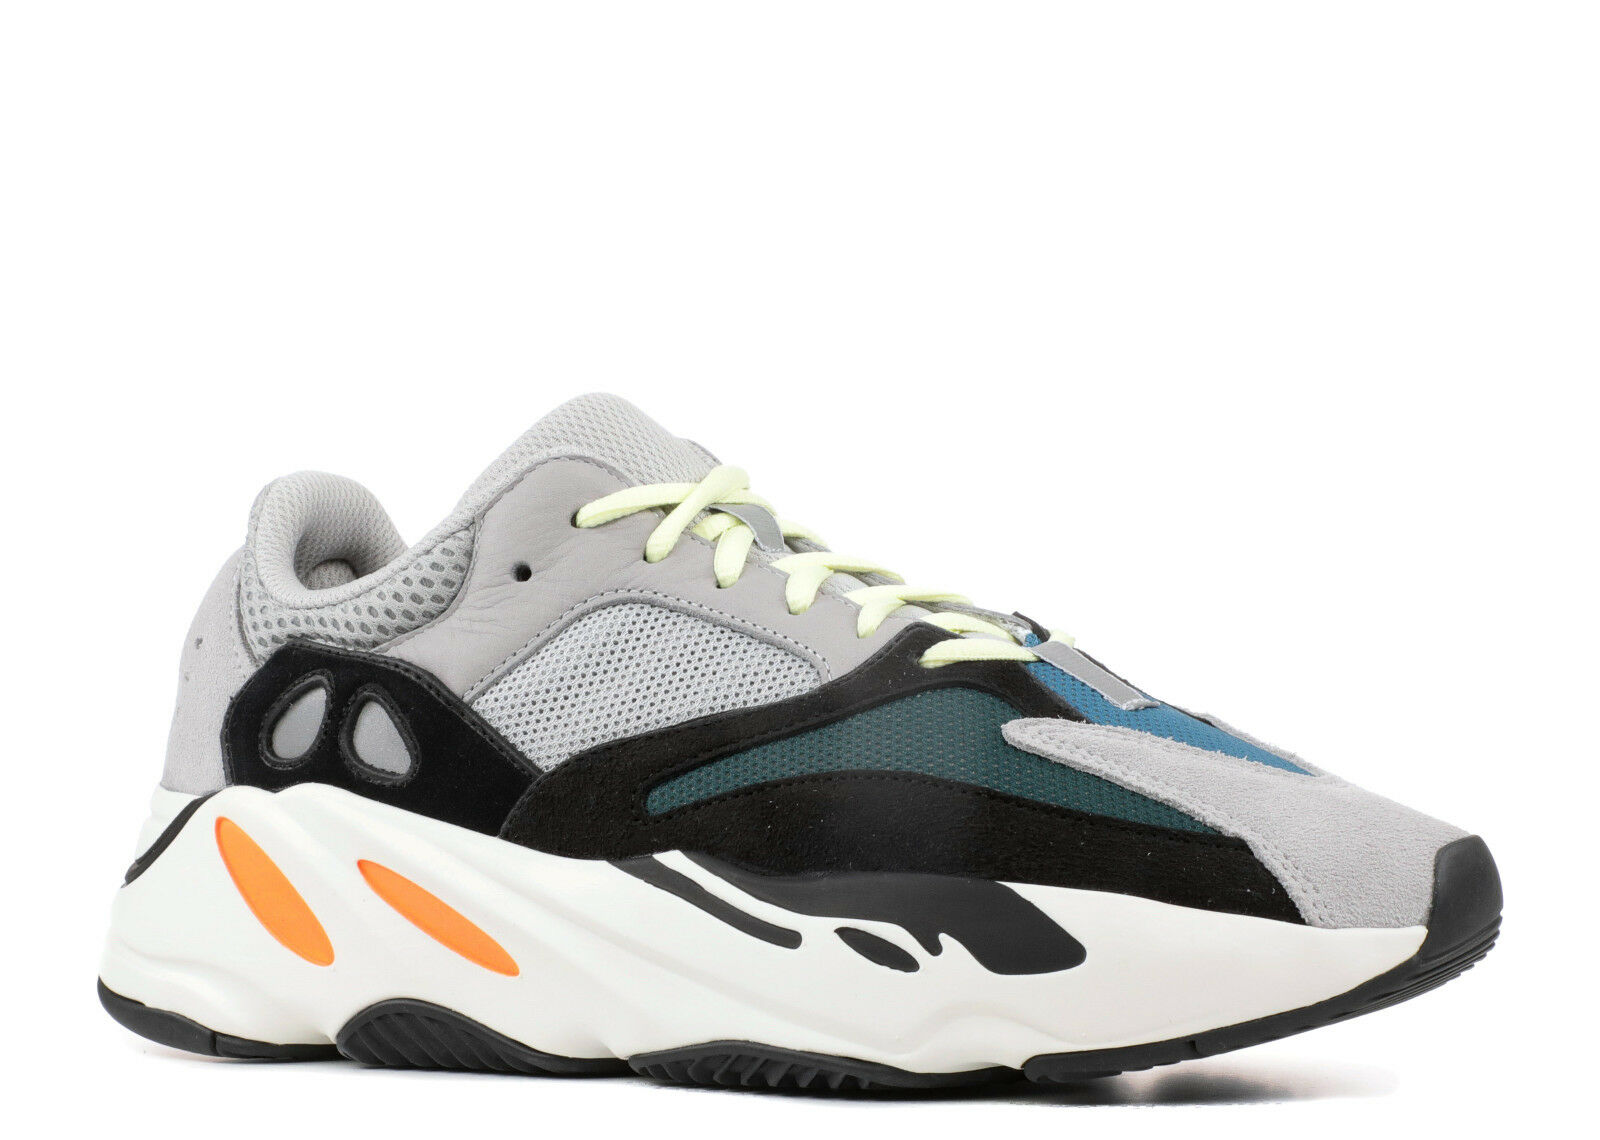 Adidas Yeezy Boost 700 Wave Runner Og Gris Noir Orange UK 10.5 US 11 EU 45 1/3